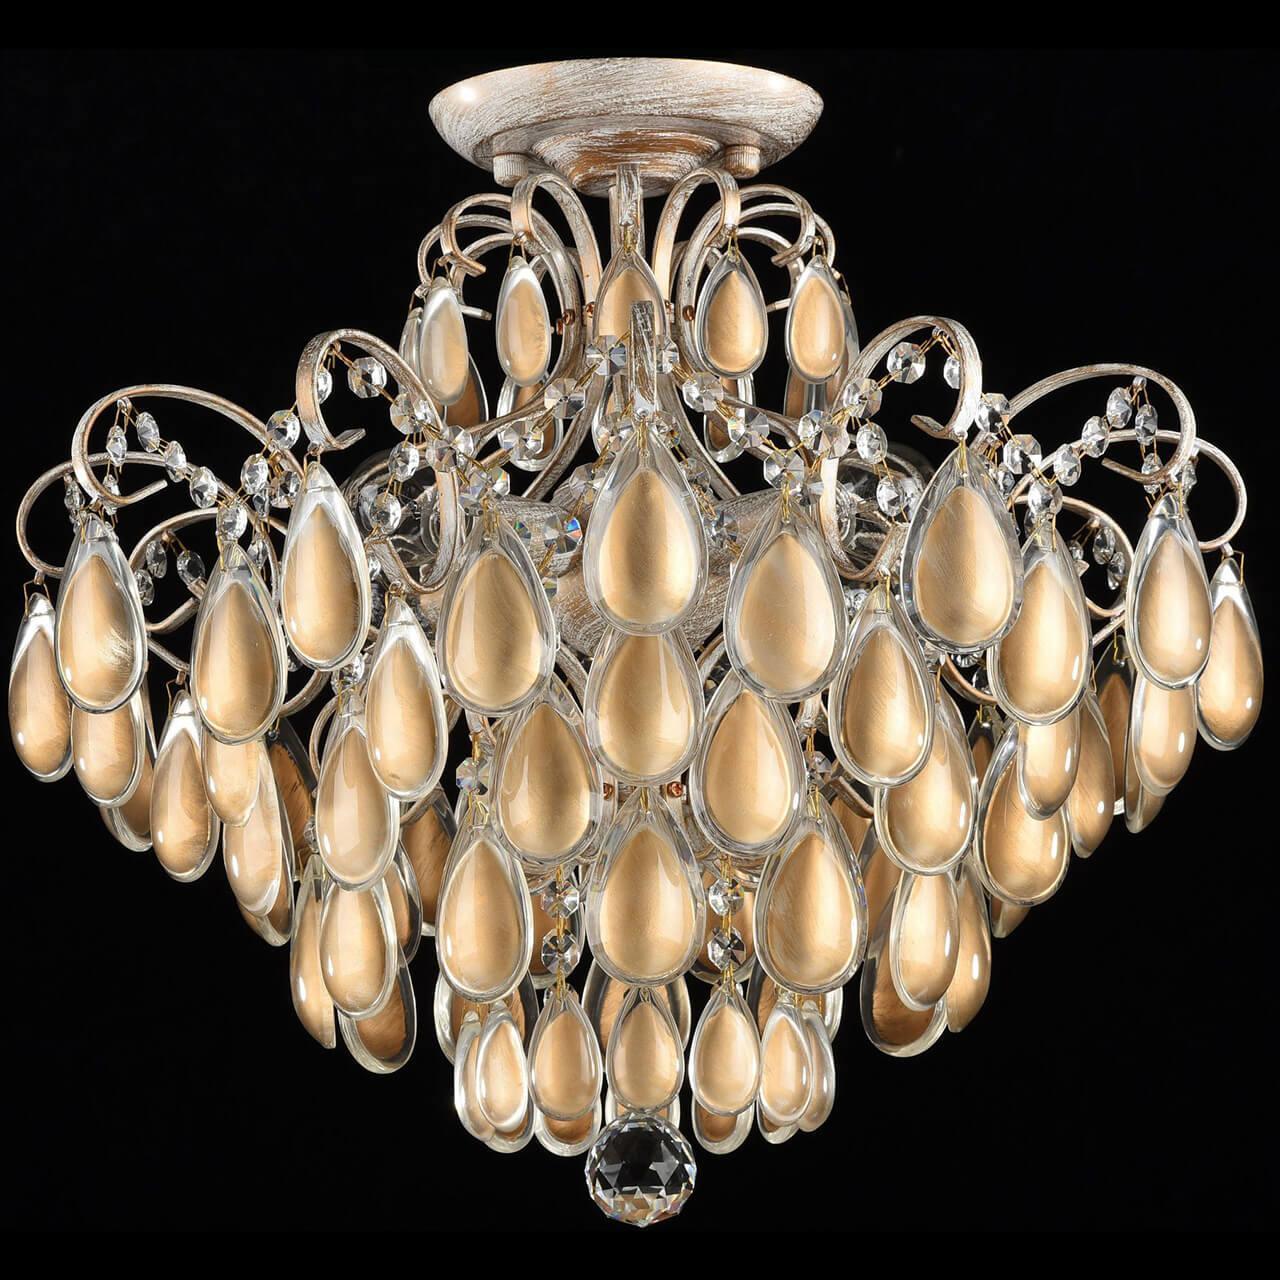 Люстра Freya Chabrol FR2302-CL-04-WG потолочная потолочная люстра freya fr5102 cl 04 ch